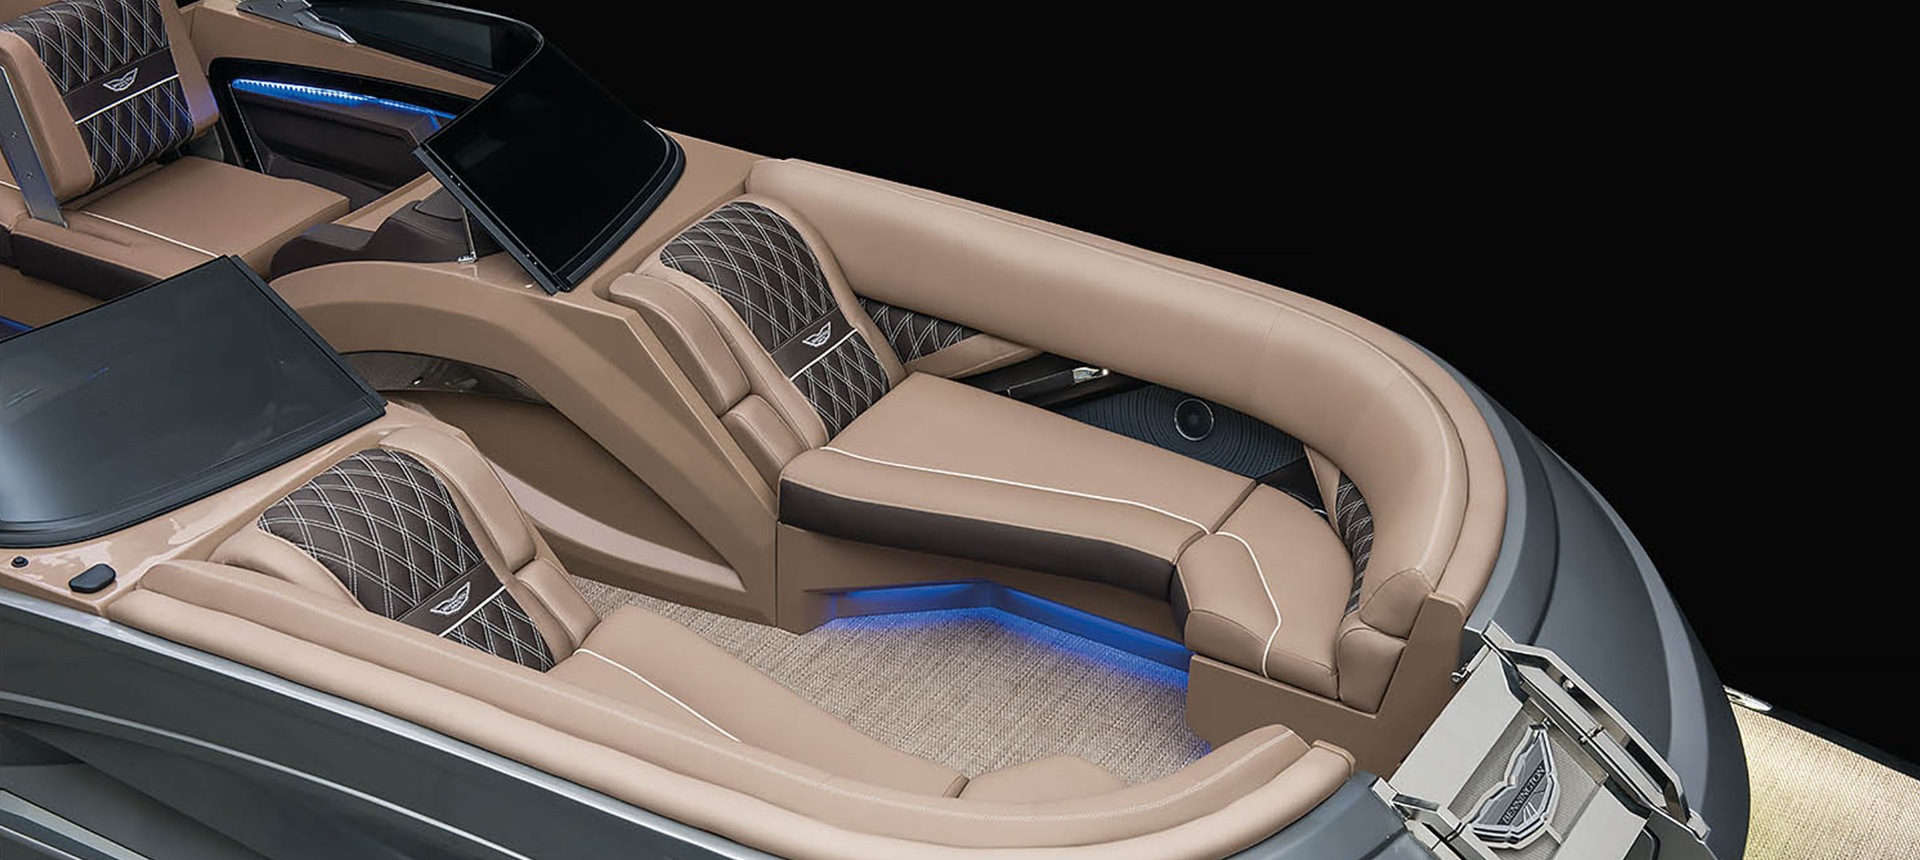 Pic of QX Sport model boat